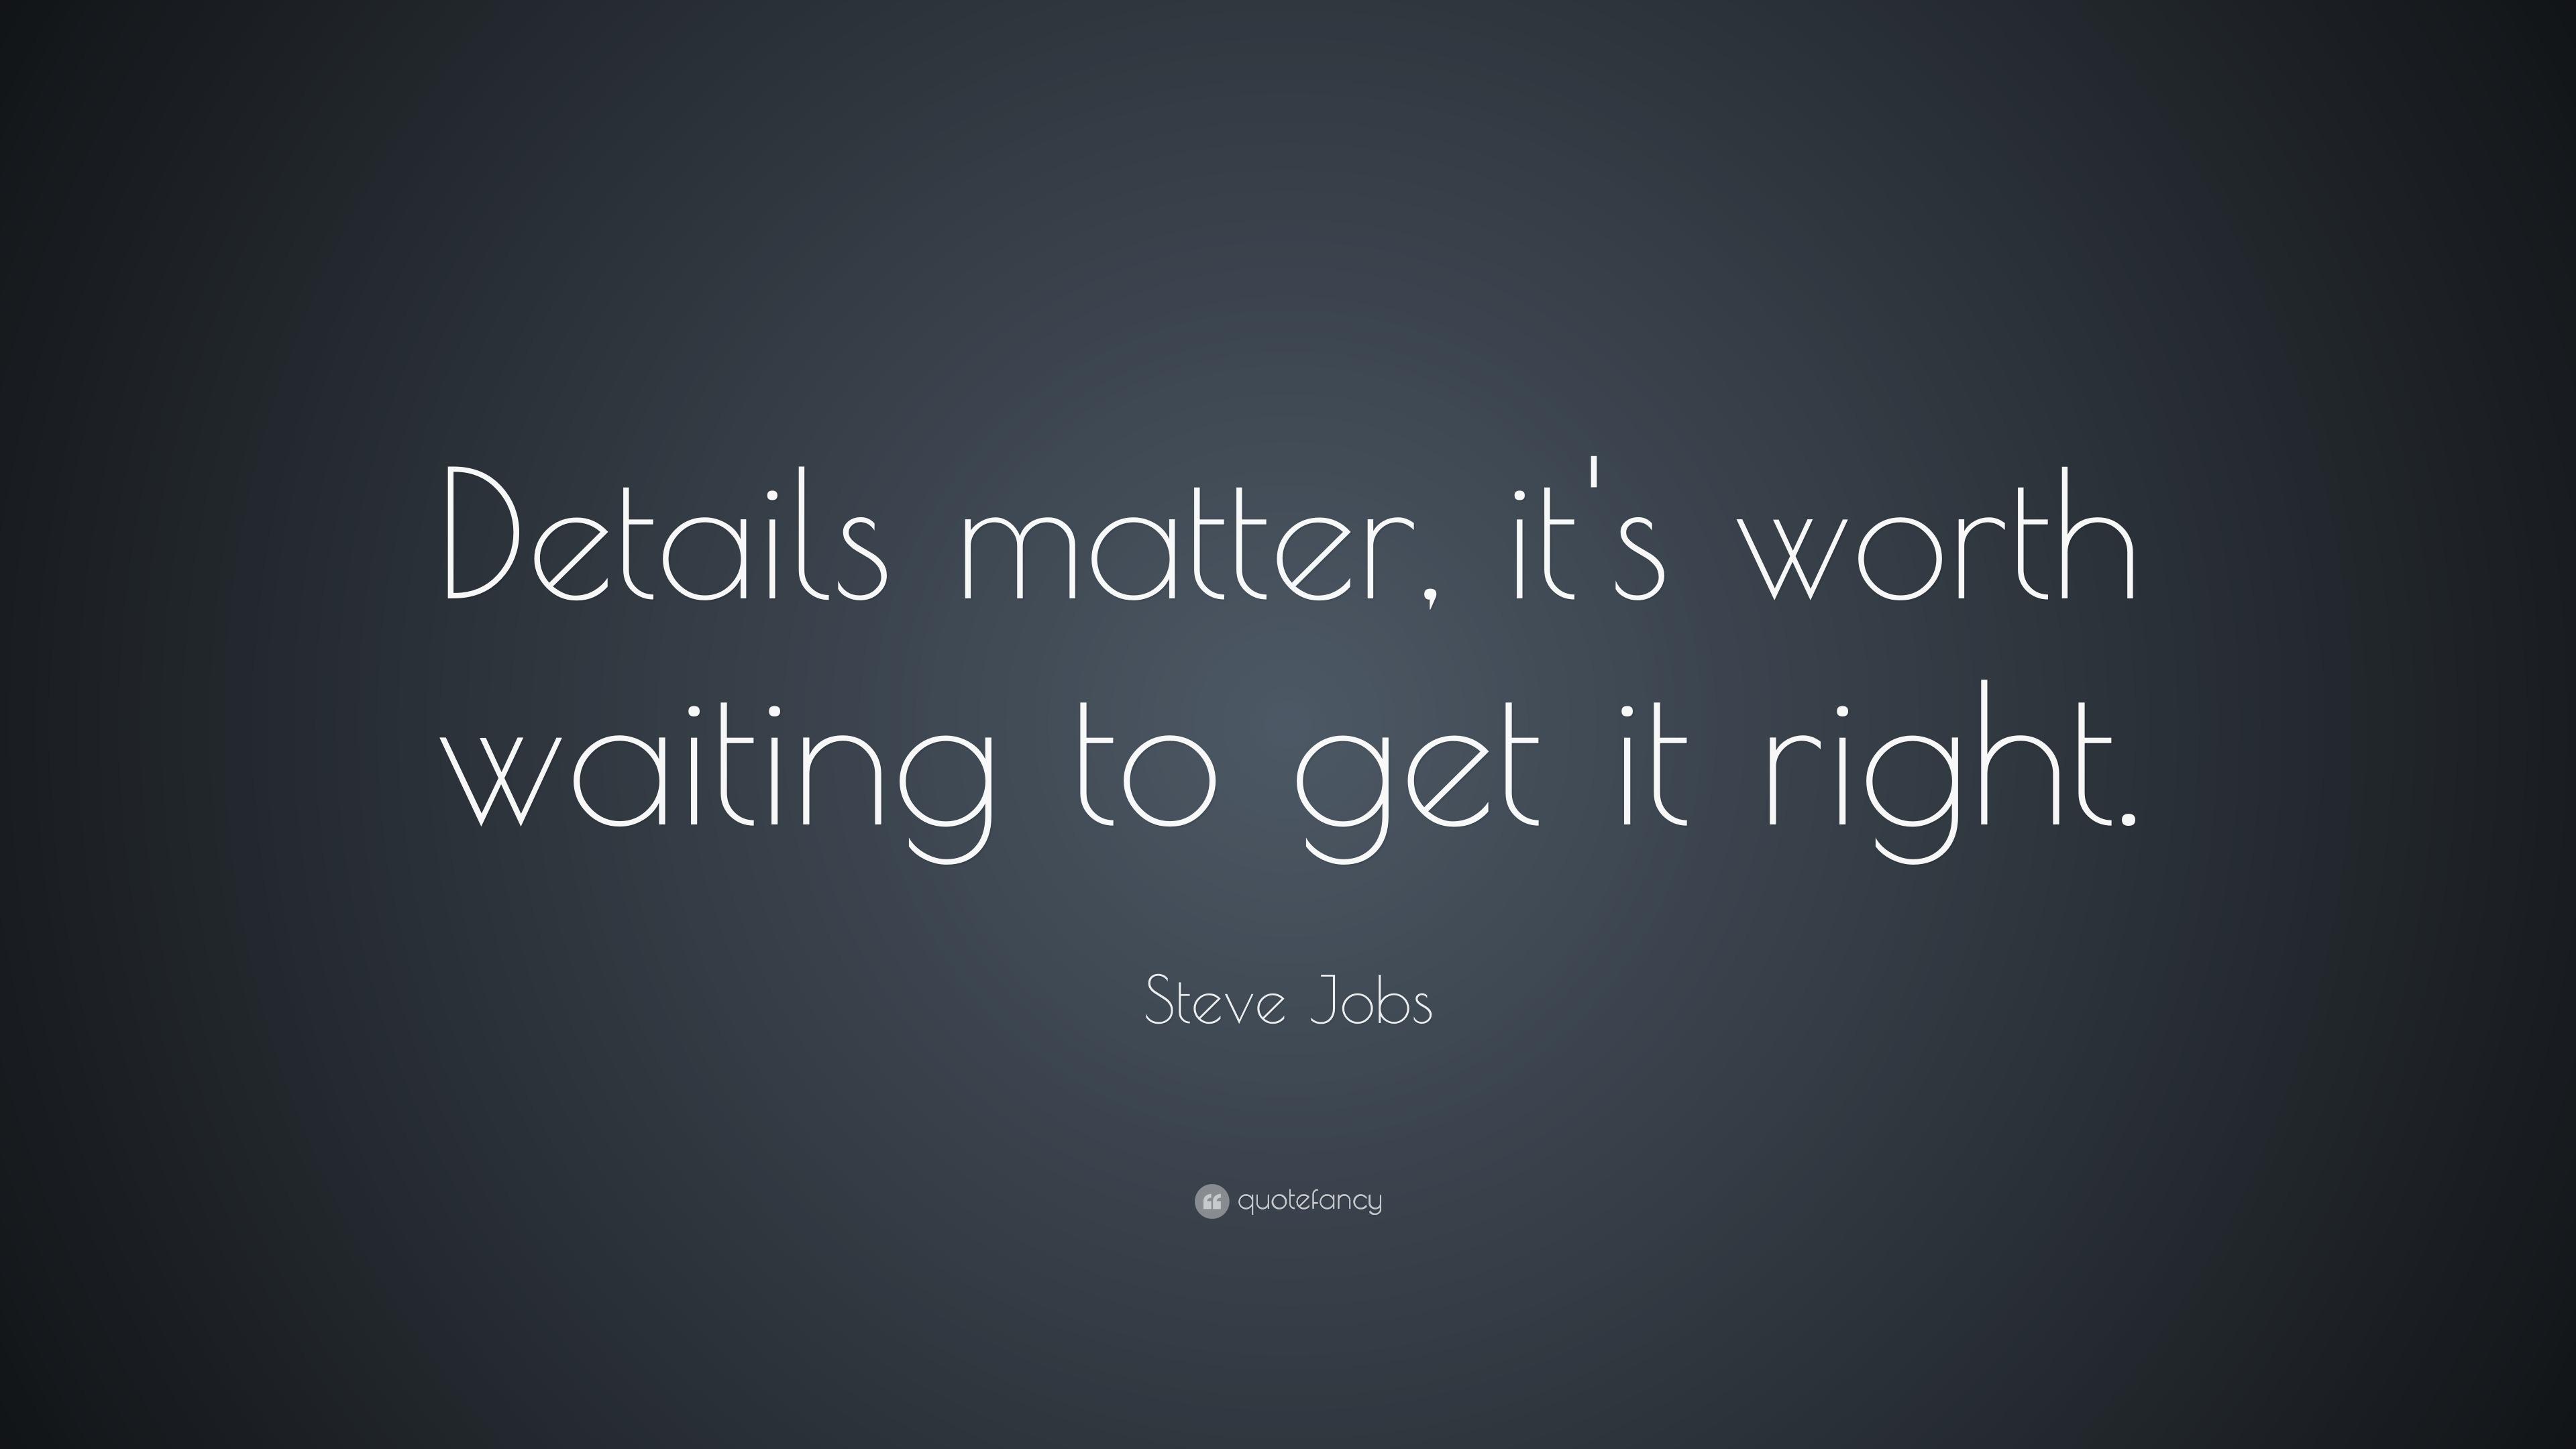 Details Matter Steve Jobs Quote